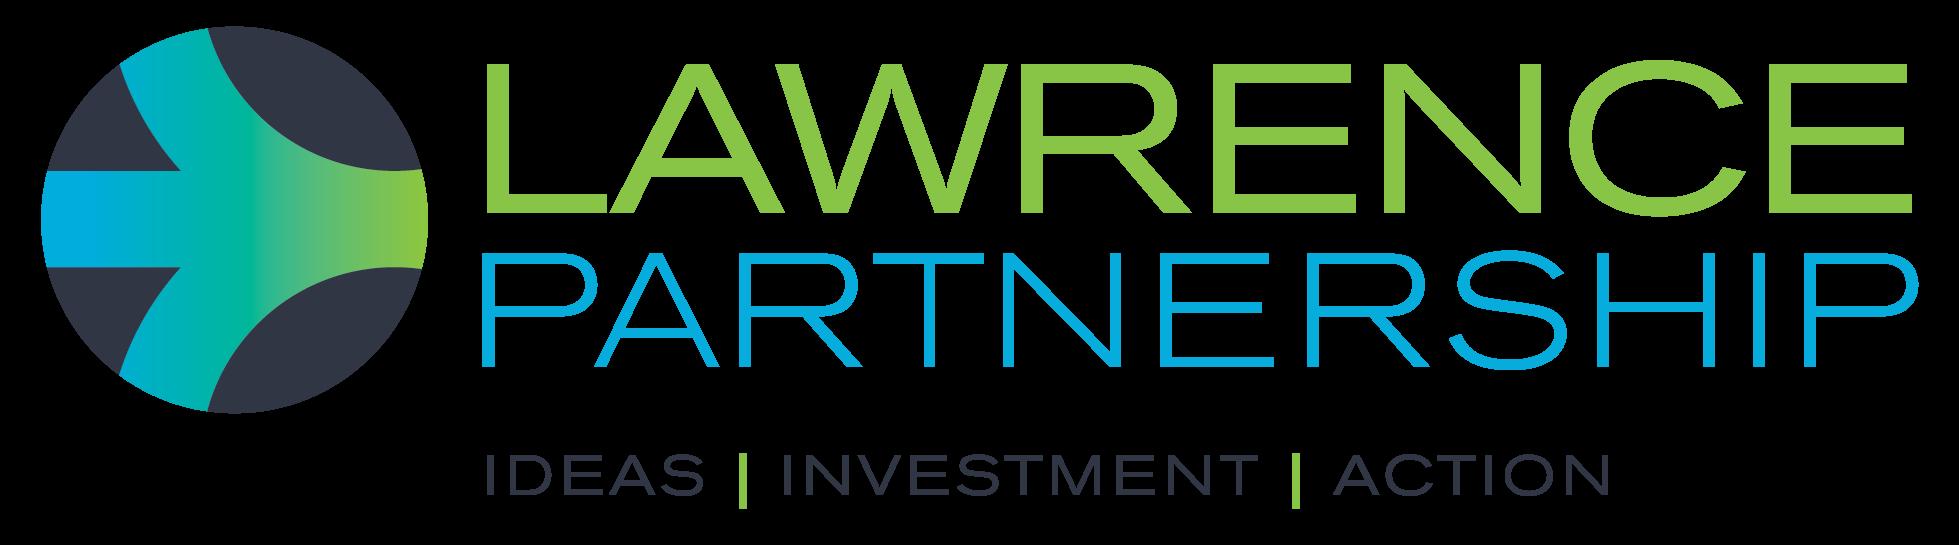 Image result for lawrence partnership logo